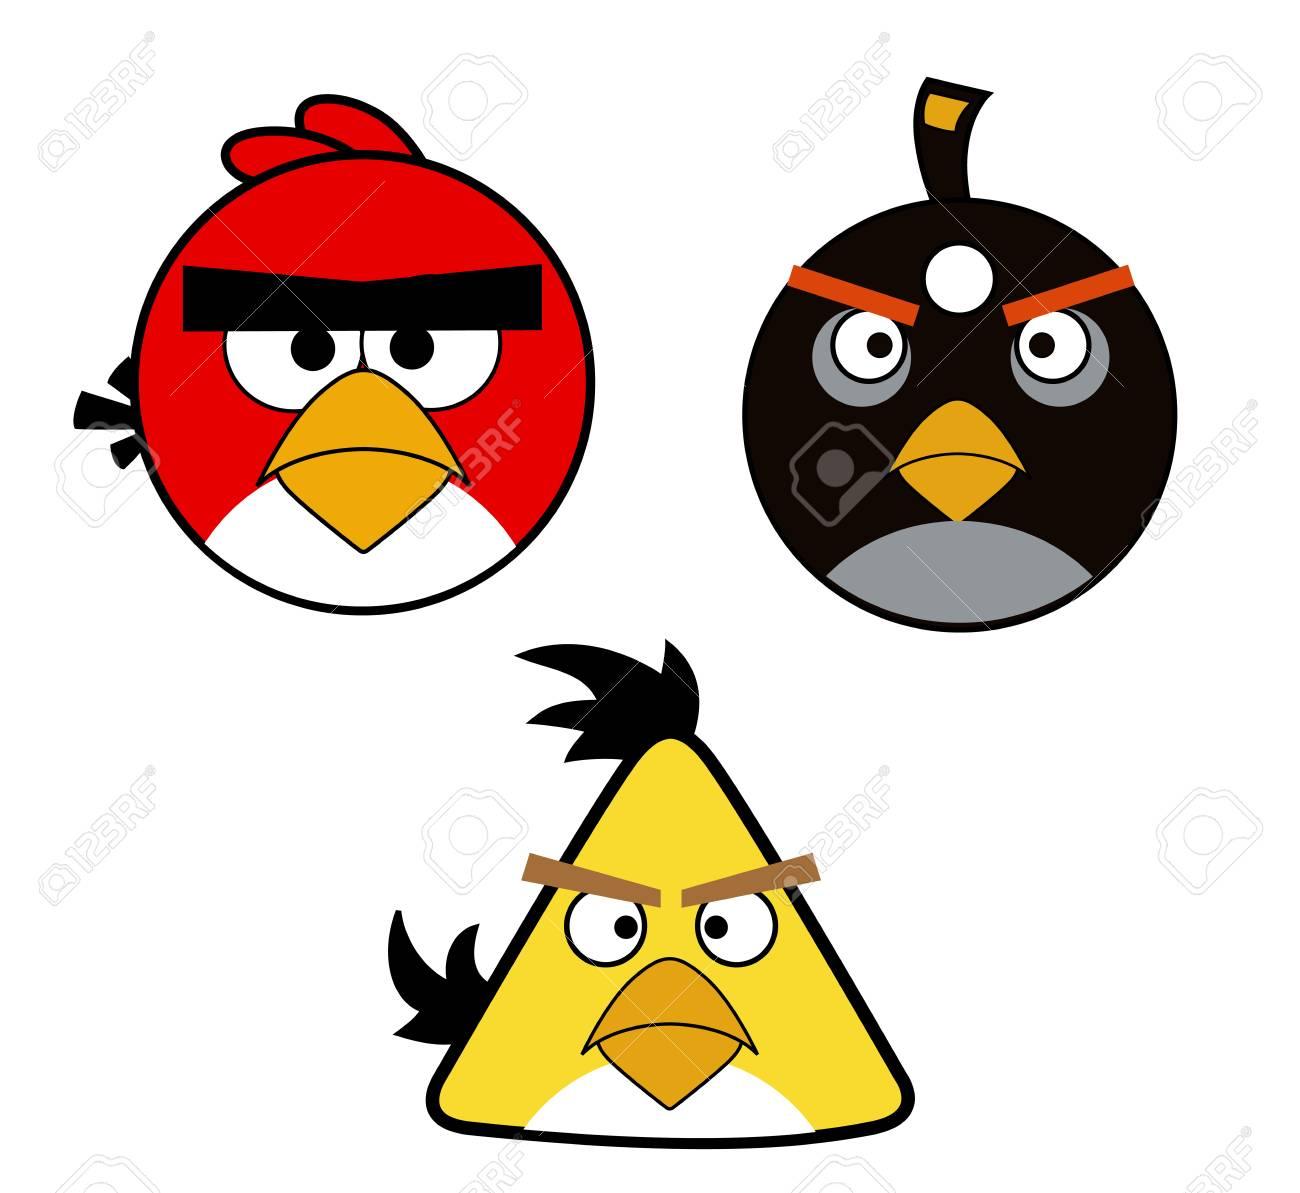 angry birds red yellow birdsbomb illustration cartoon